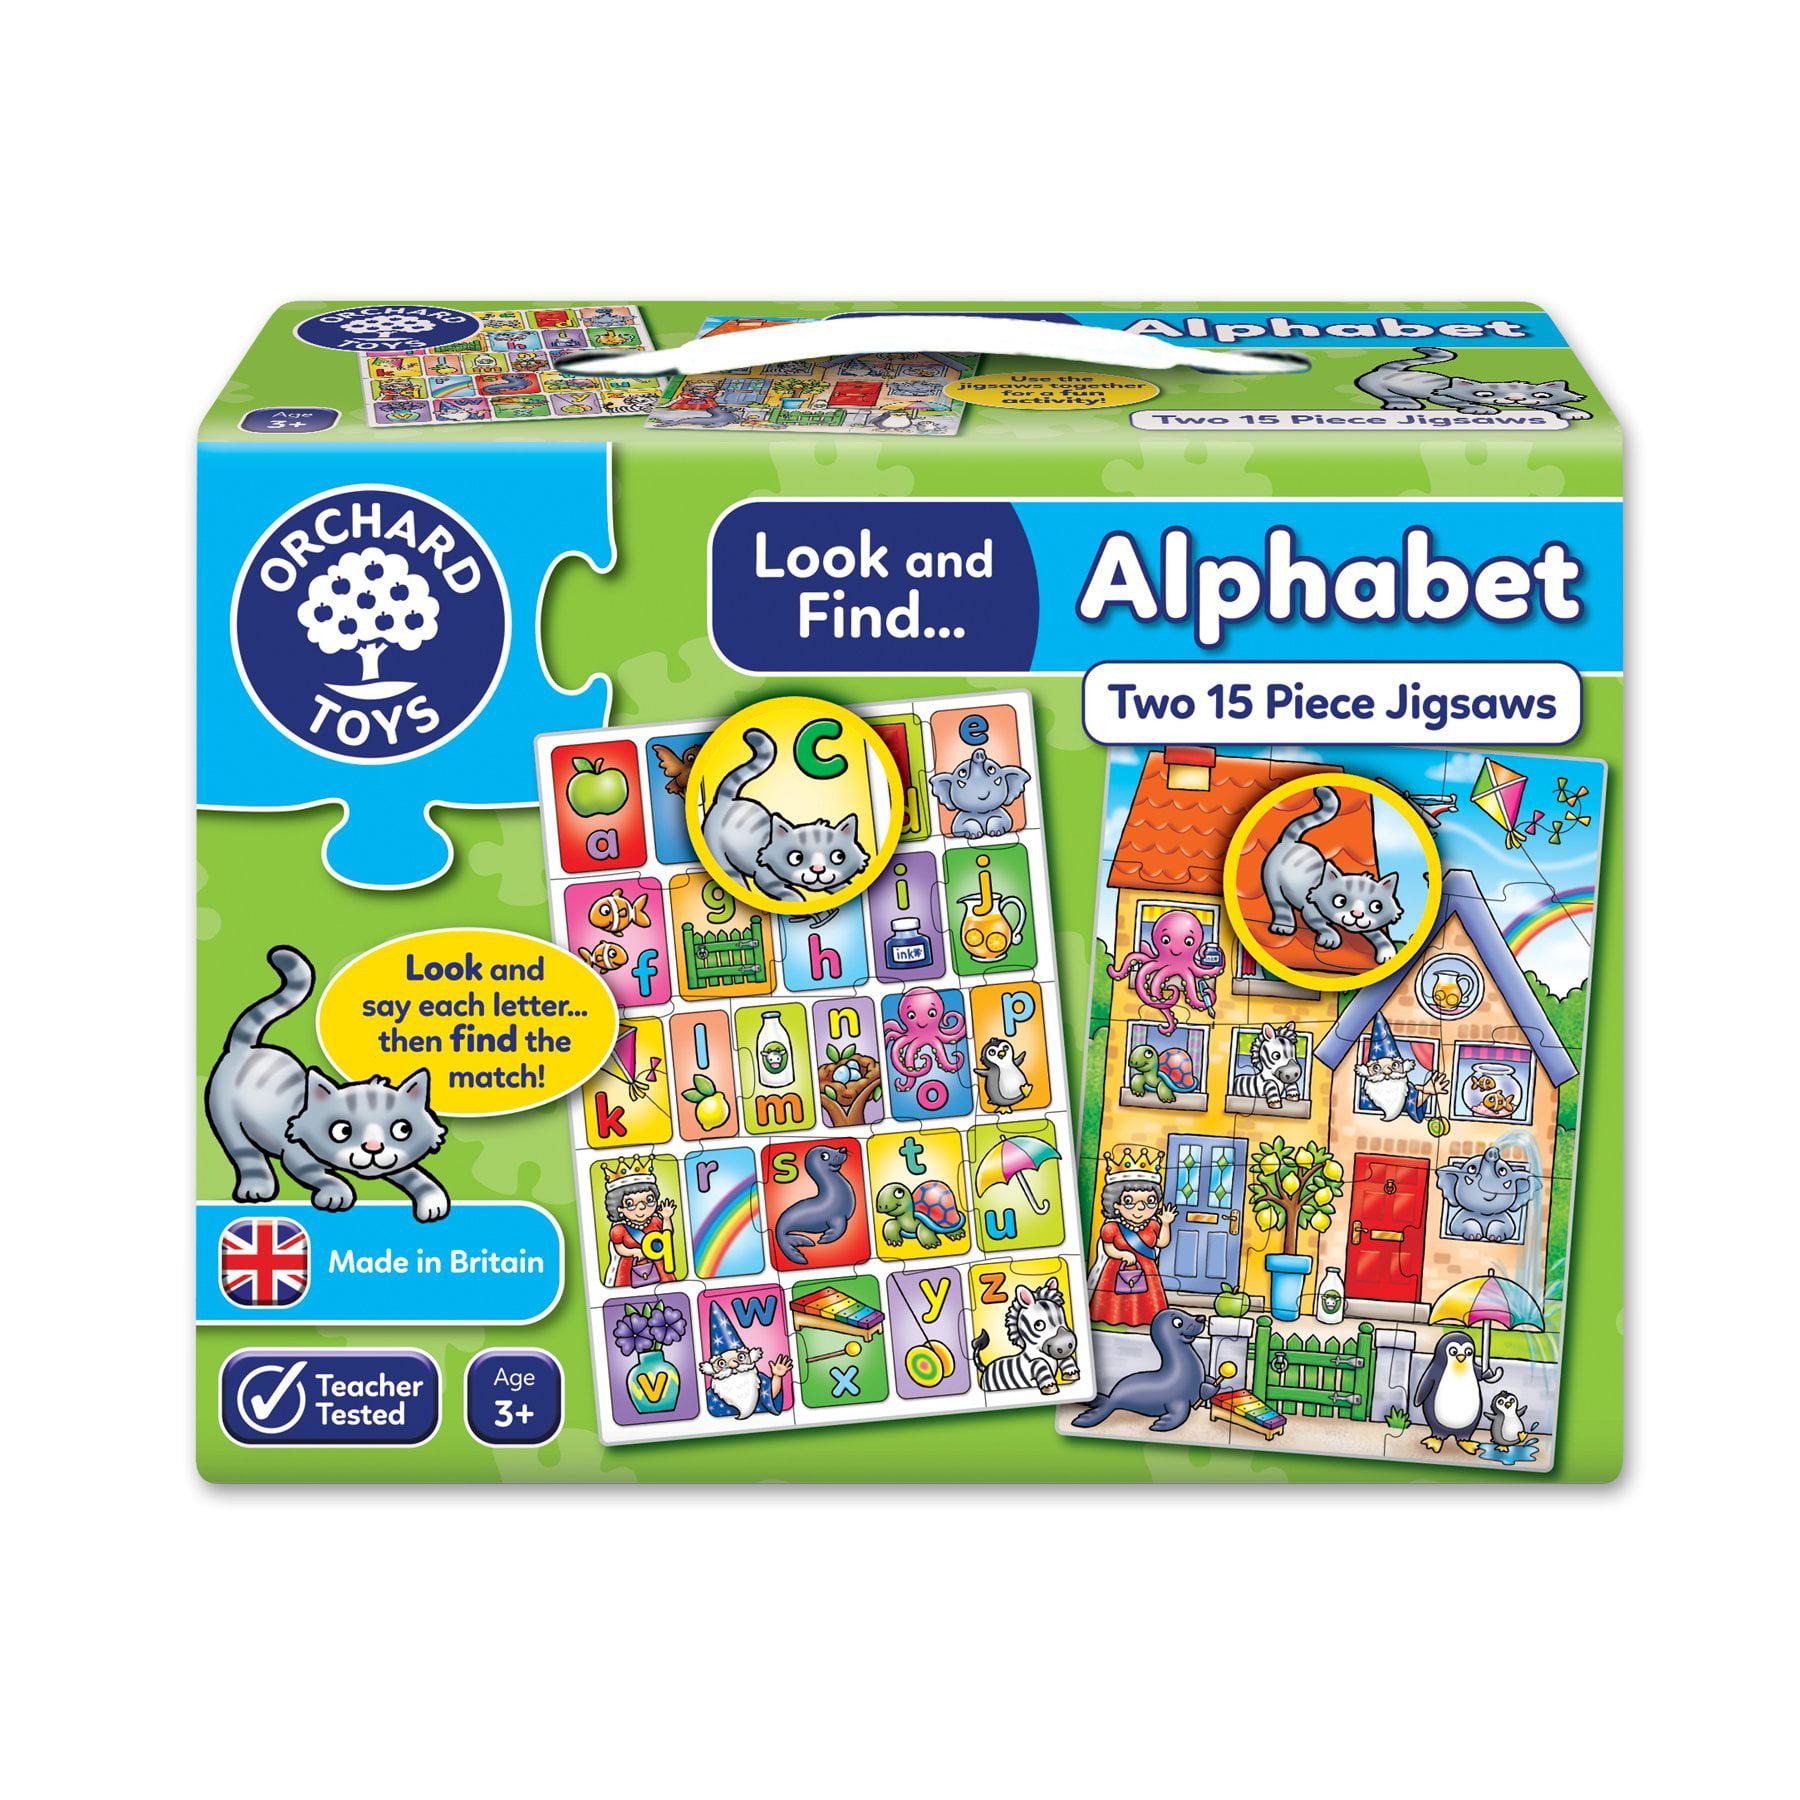 Galt GIANT FLOOR PUZZLE JUNGLE Children Toys And Activities BN